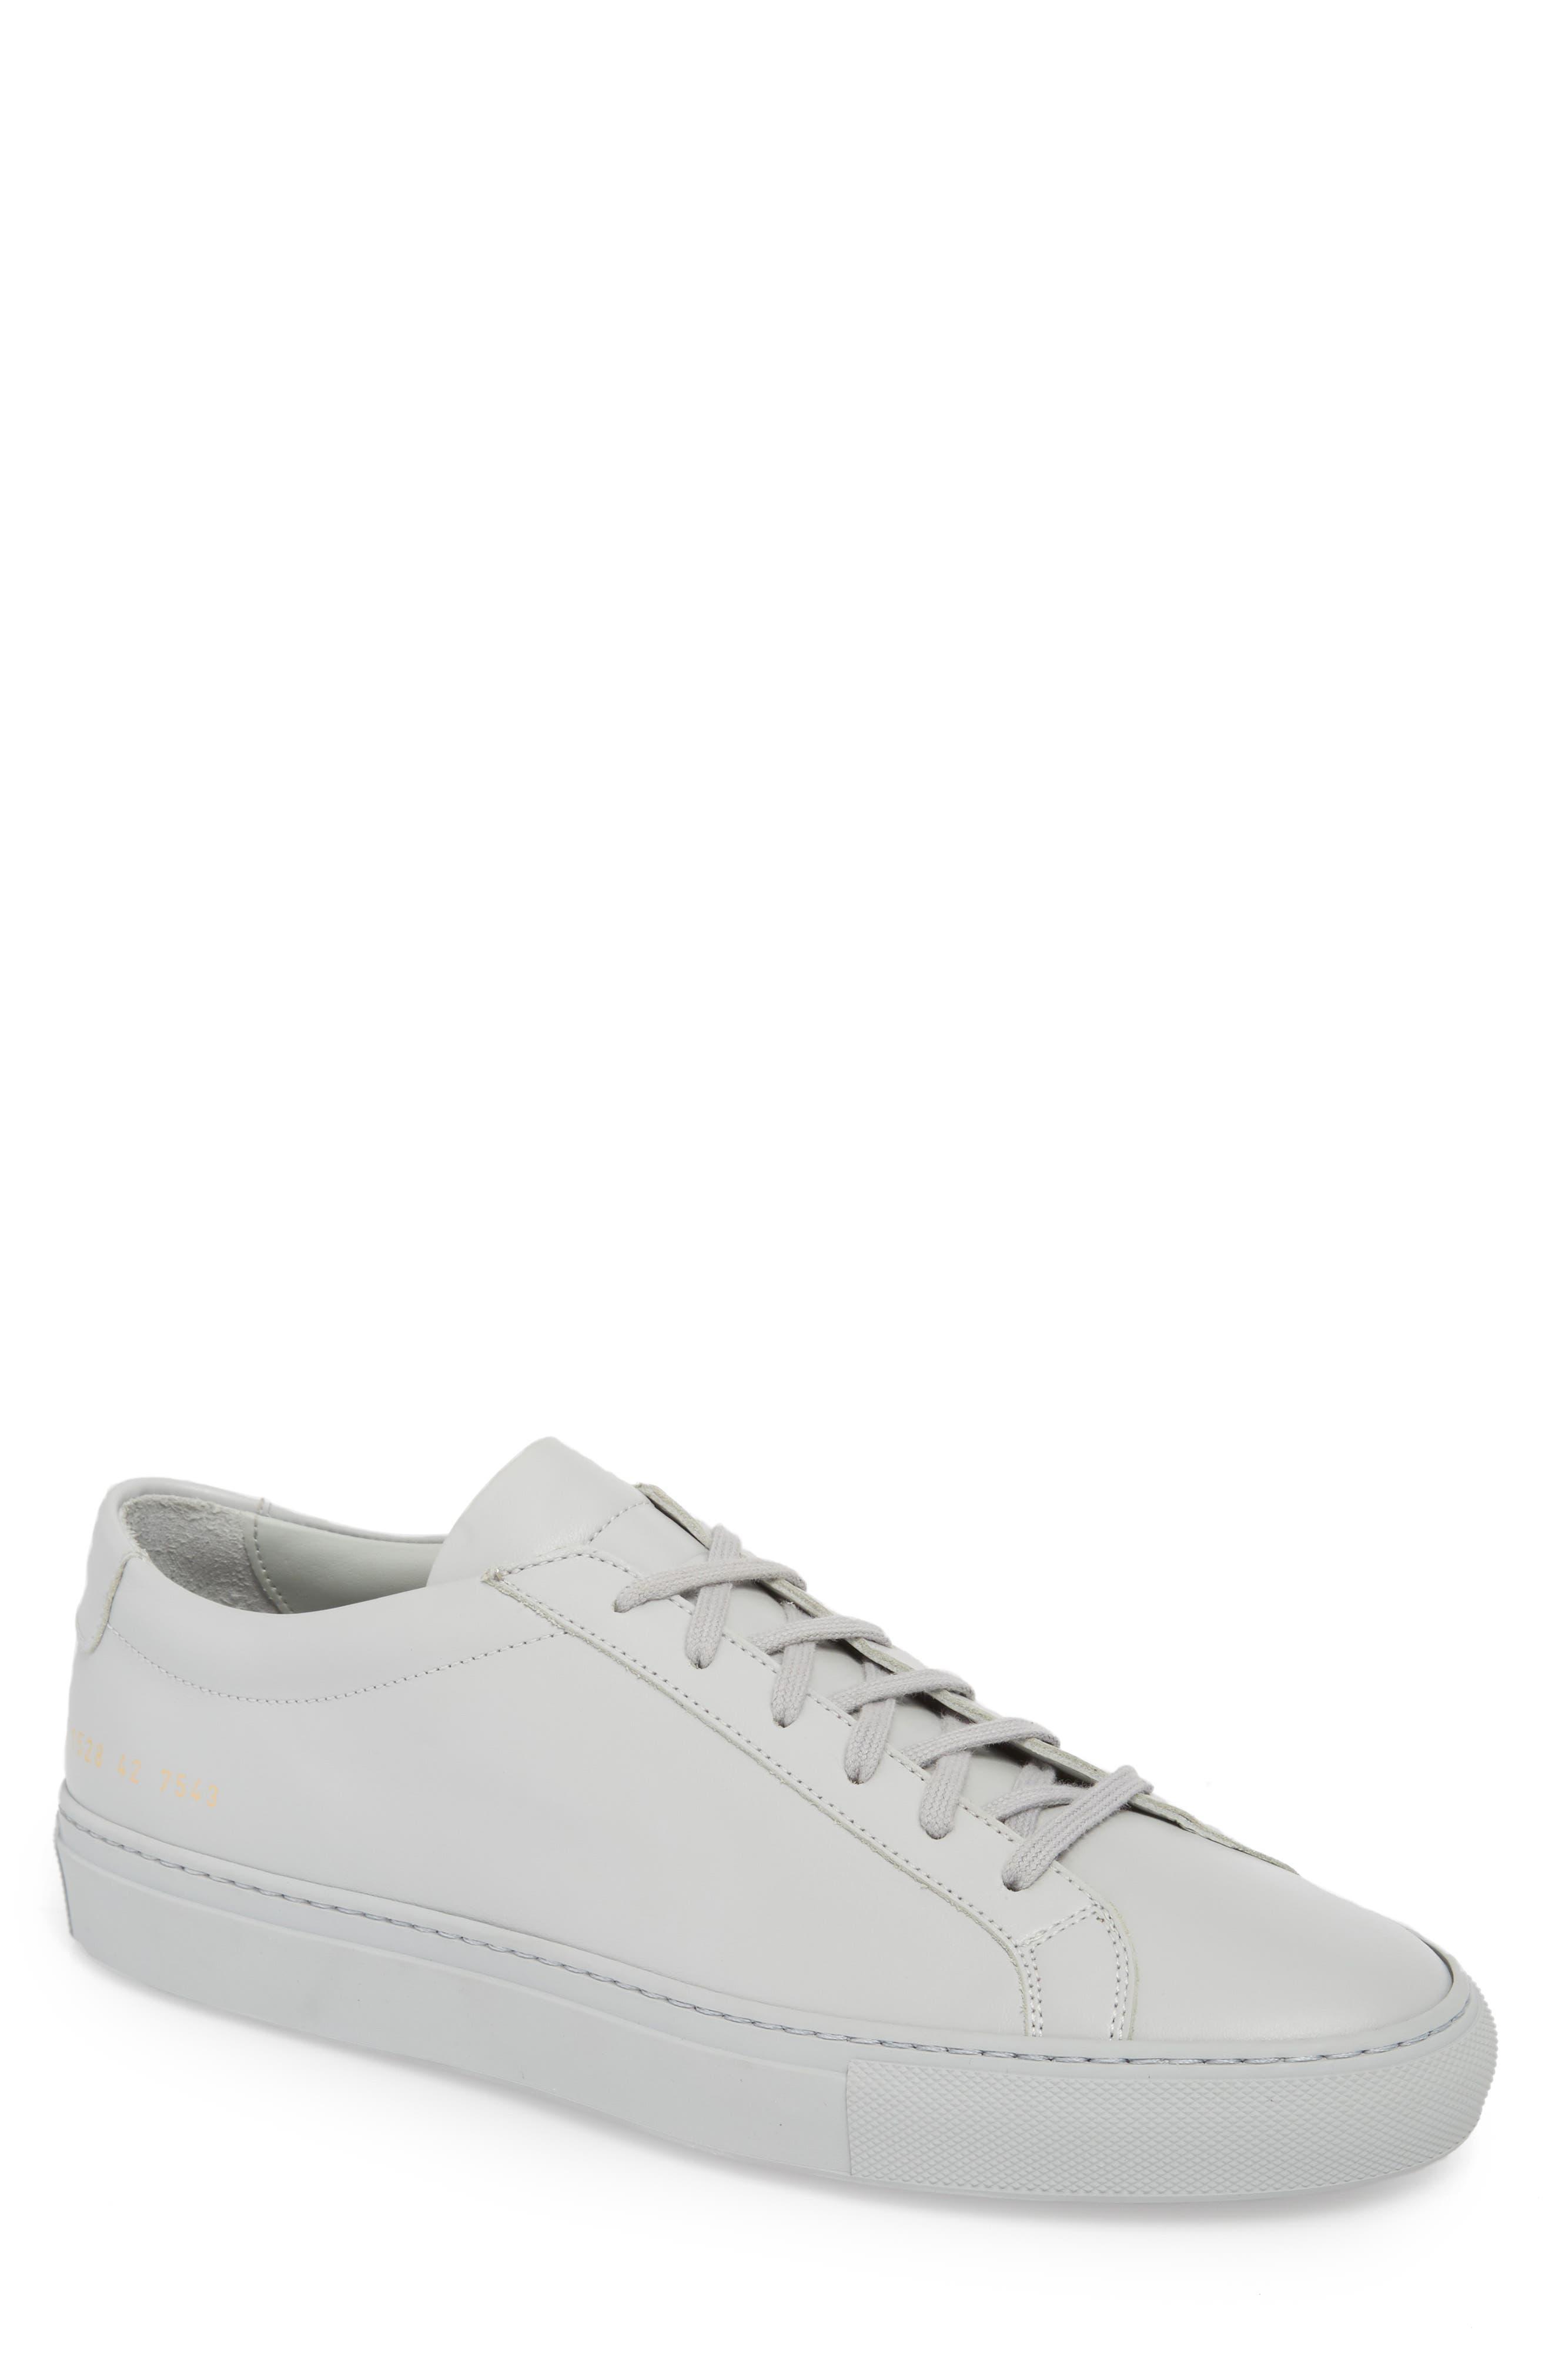 Original Achilles Sneaker,                         Main,                         color, GREY LEATHER